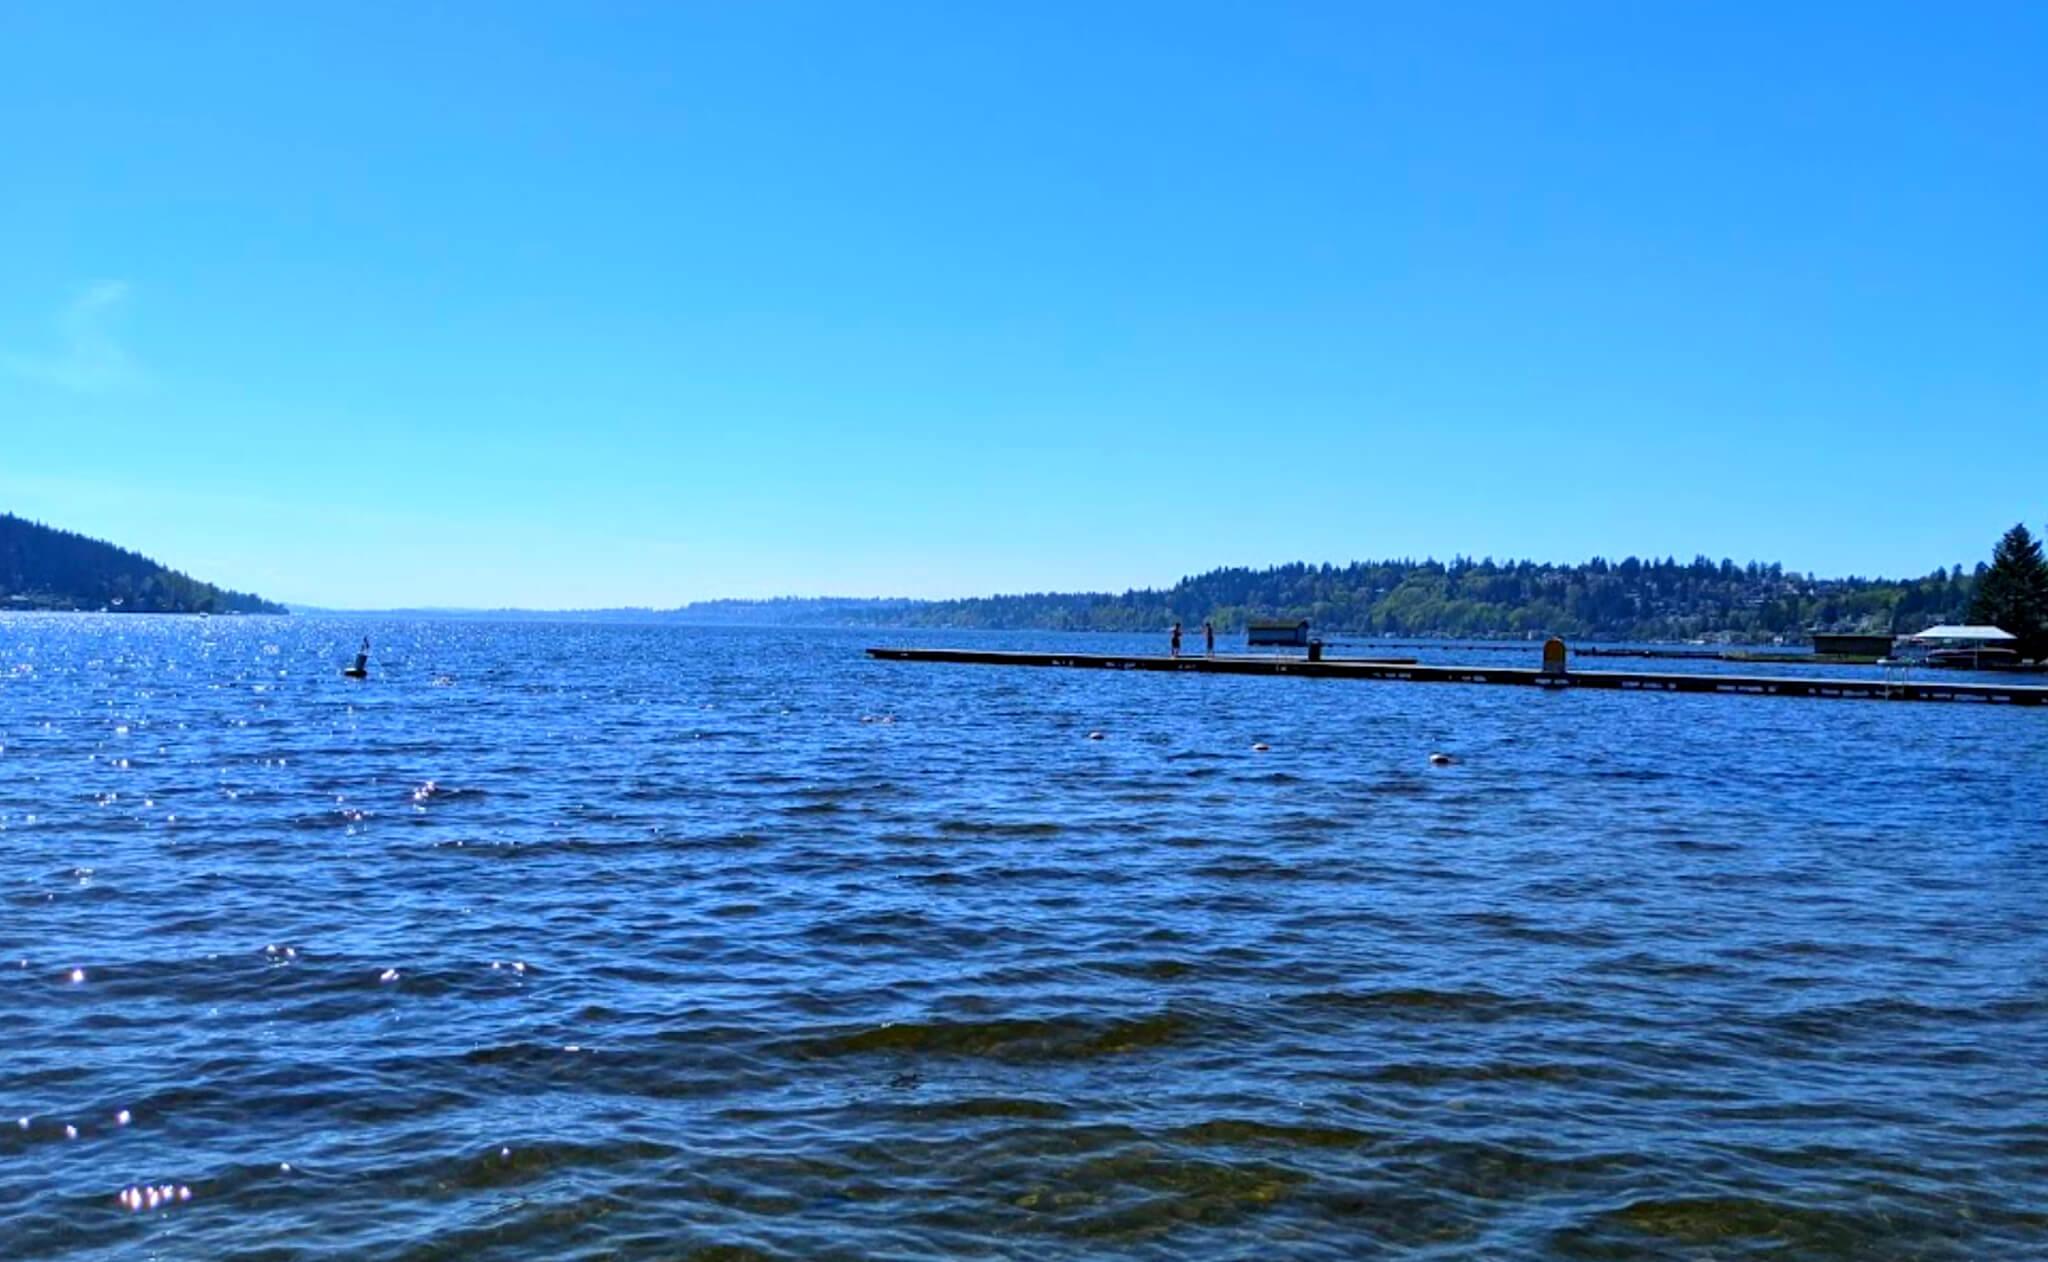 Washington-Lake-Fishing-Report-Guide-WA-02